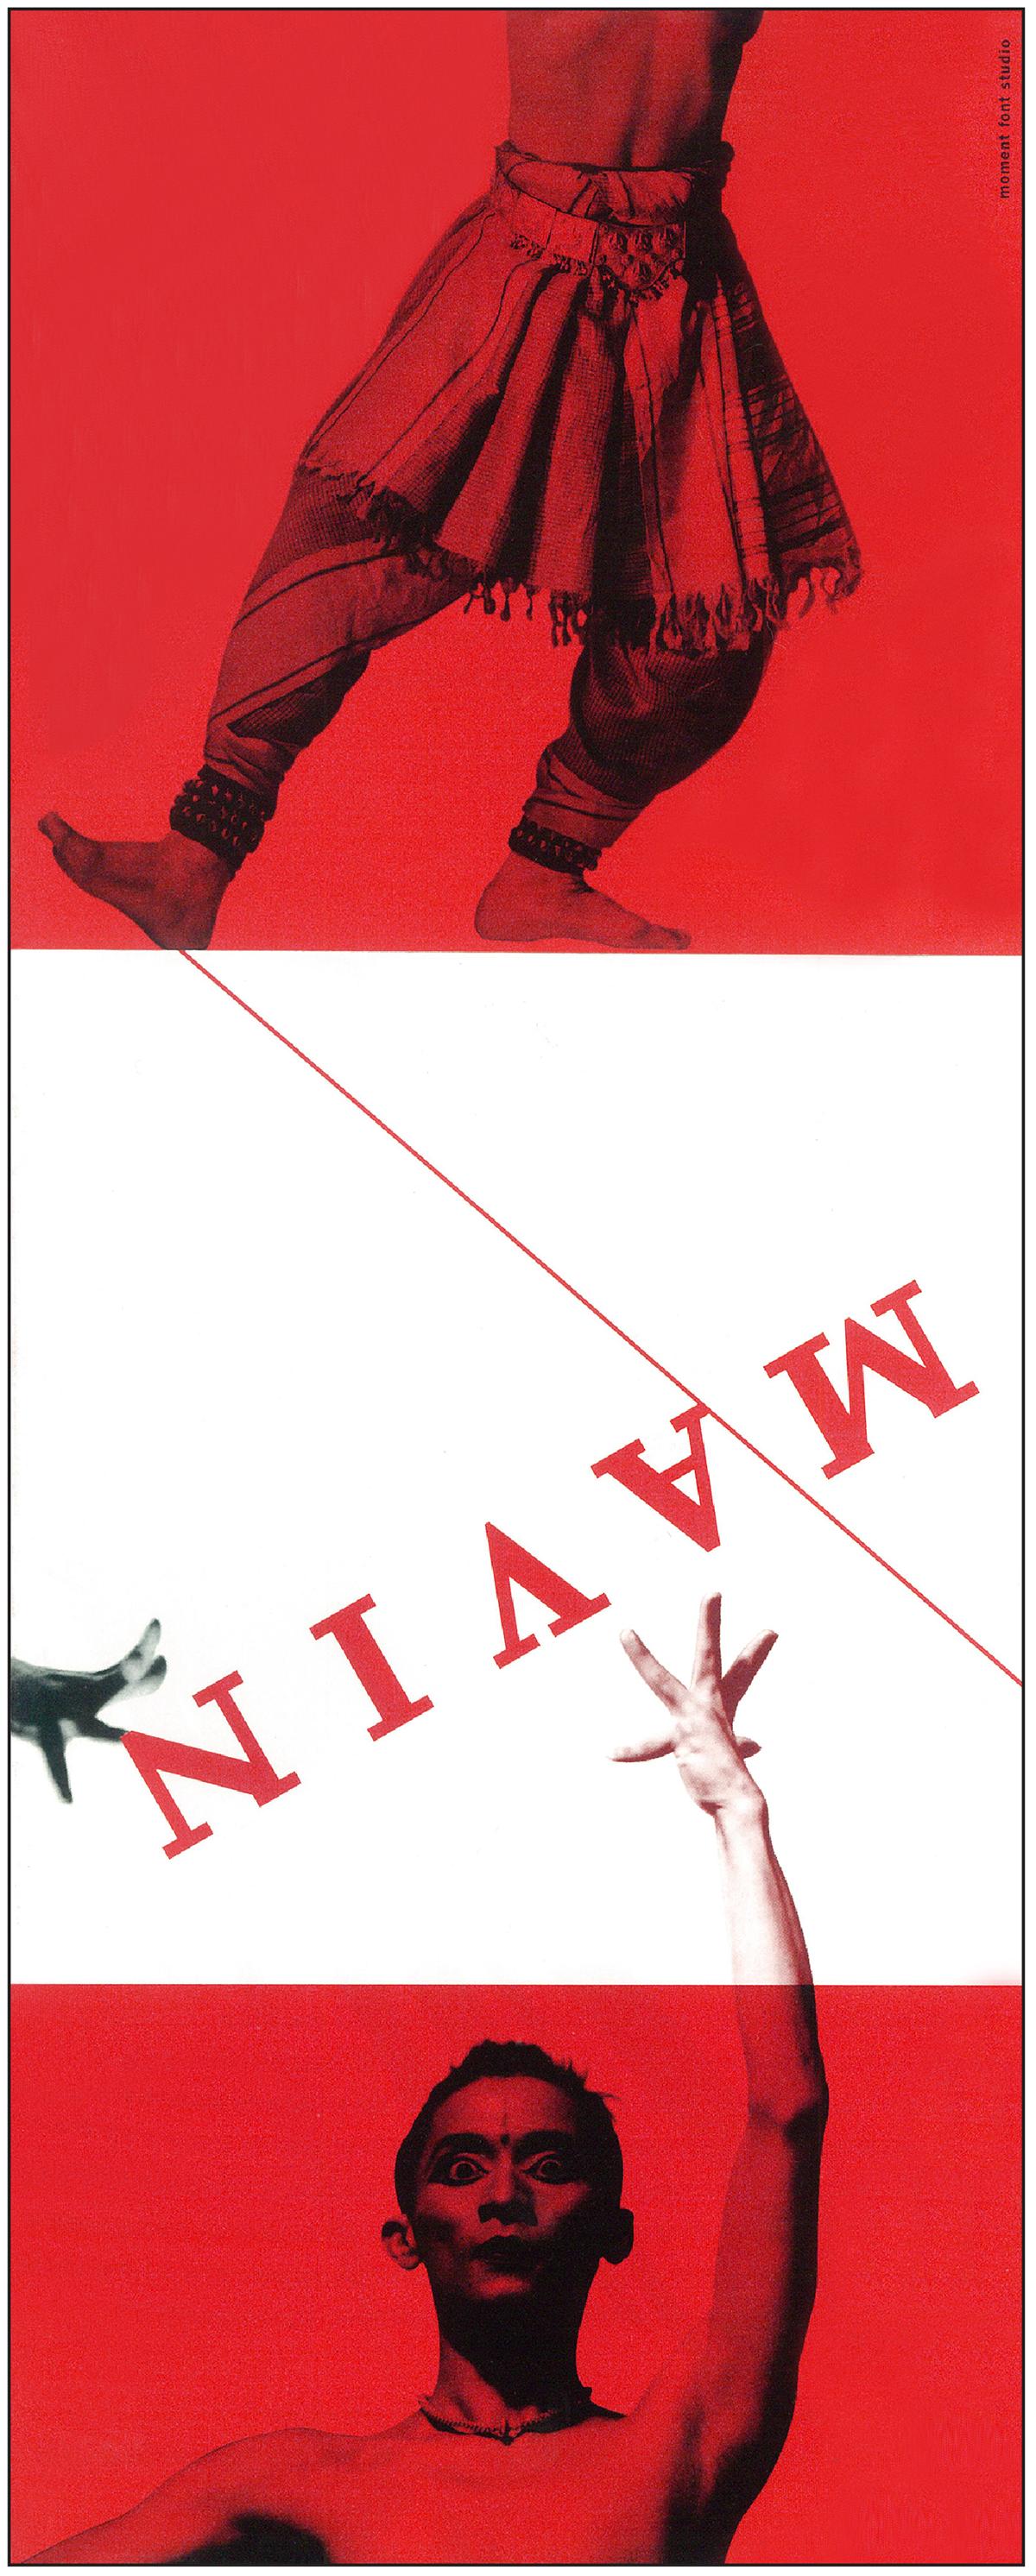 Cover of programme leaflet